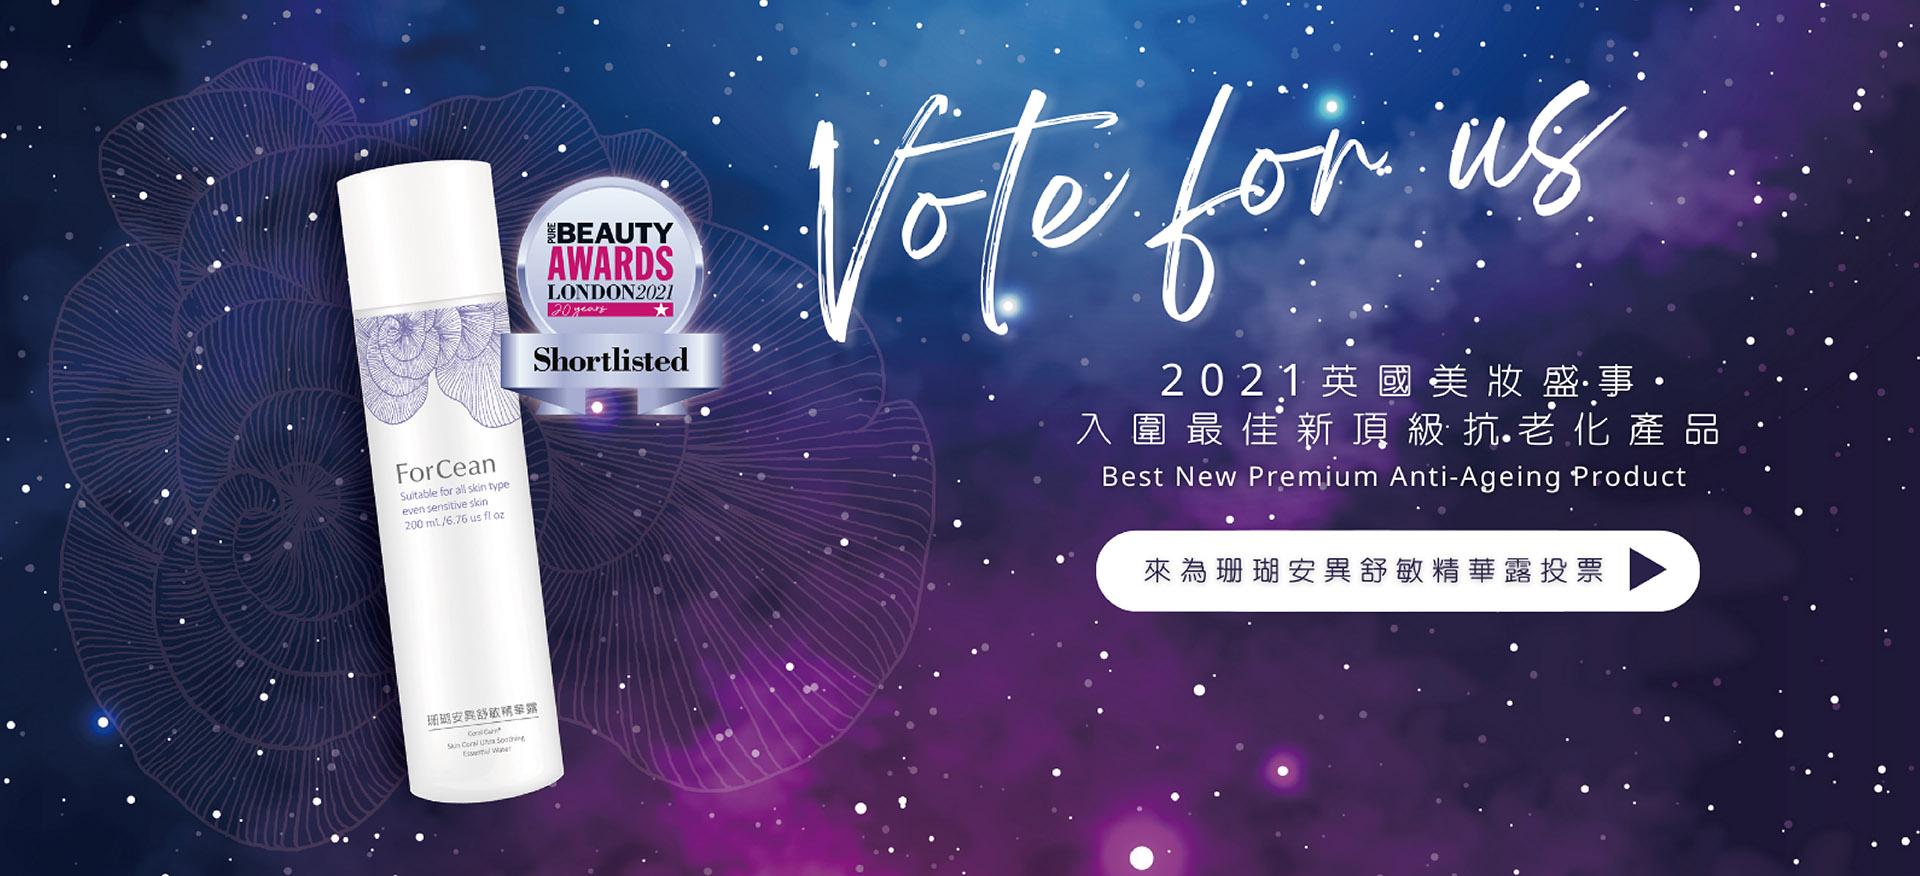 2021 Pure Beauty Awards-ForCean